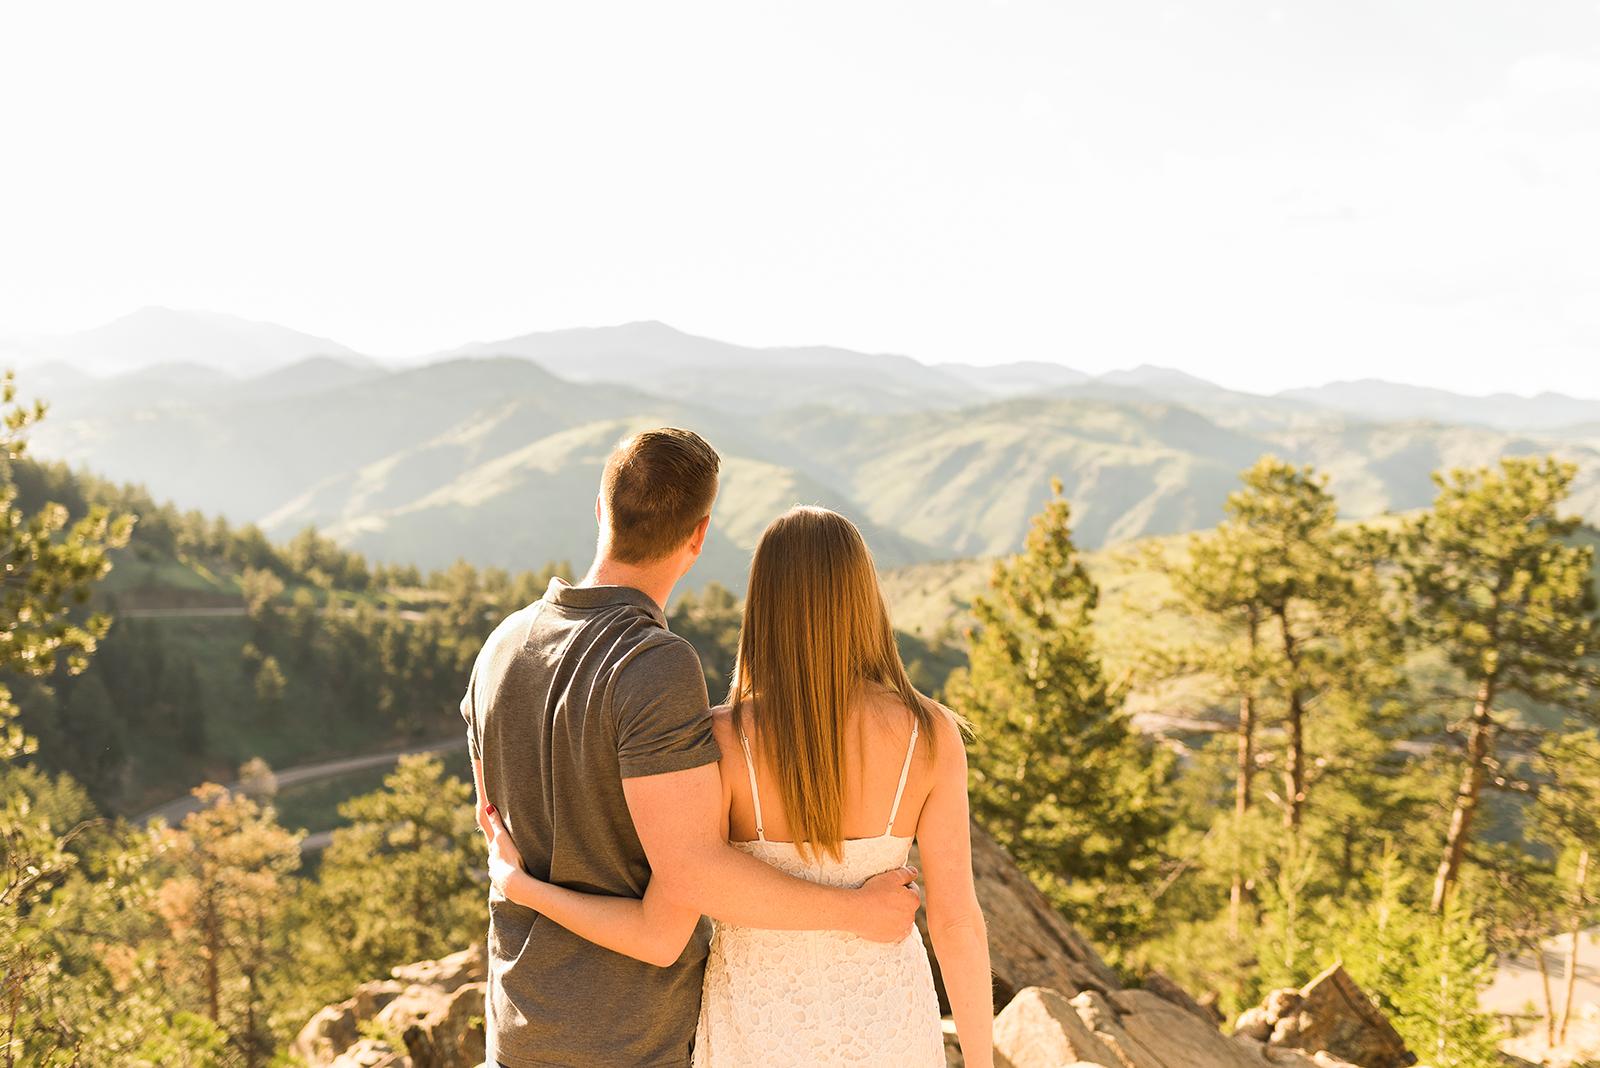 lookout-mountain-engagement-session-denver-engagement-photographer-29.jpg